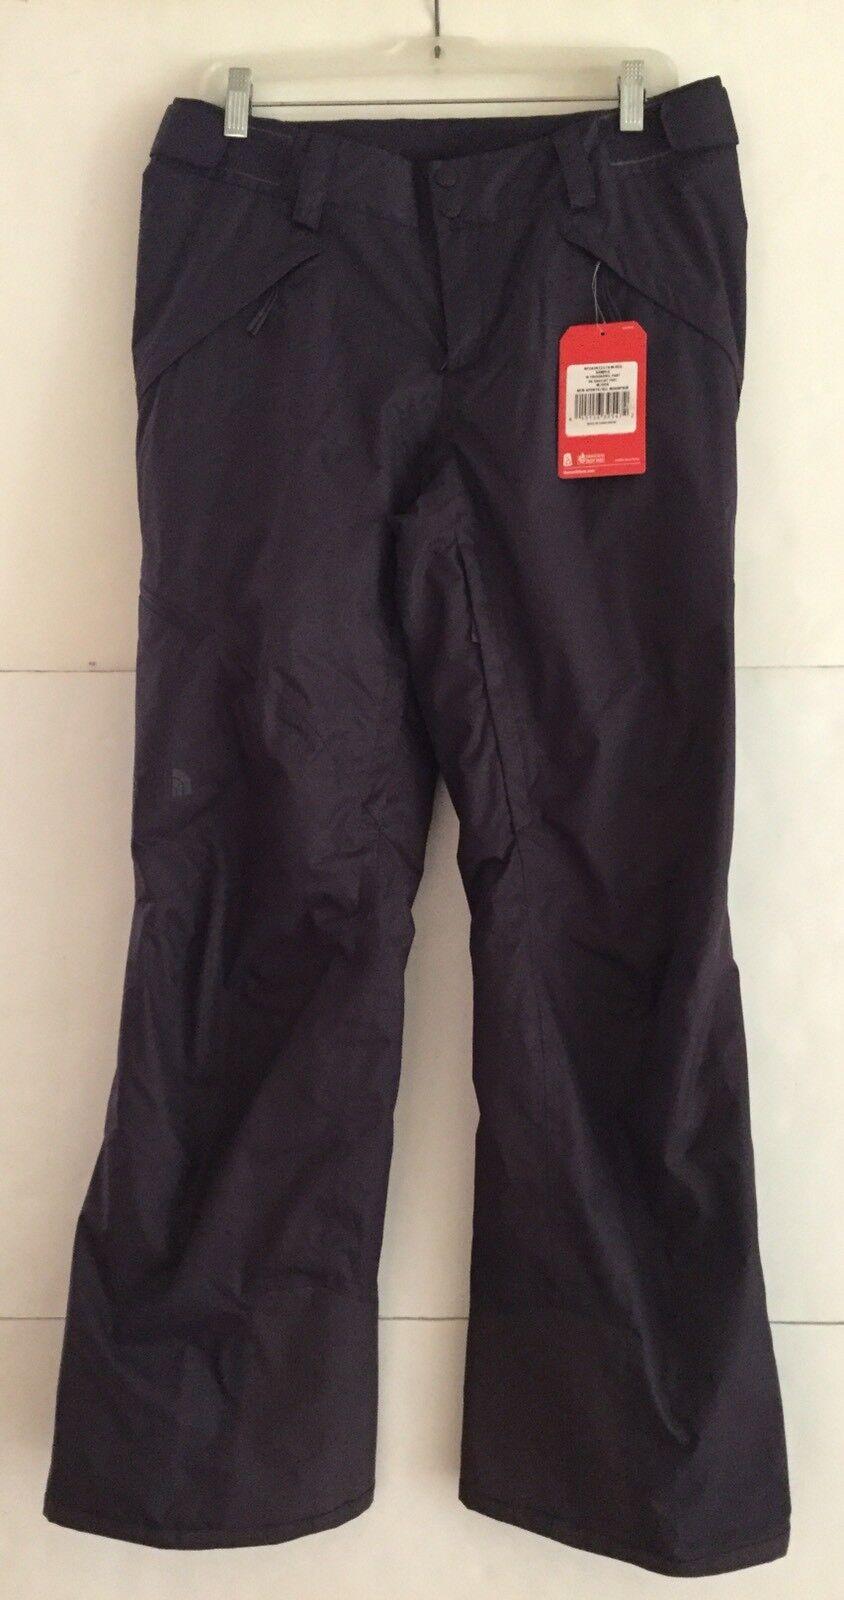 North Face Women's Medium Fourbarrel Insulated Ski Pants in Dark Eggplant Purple